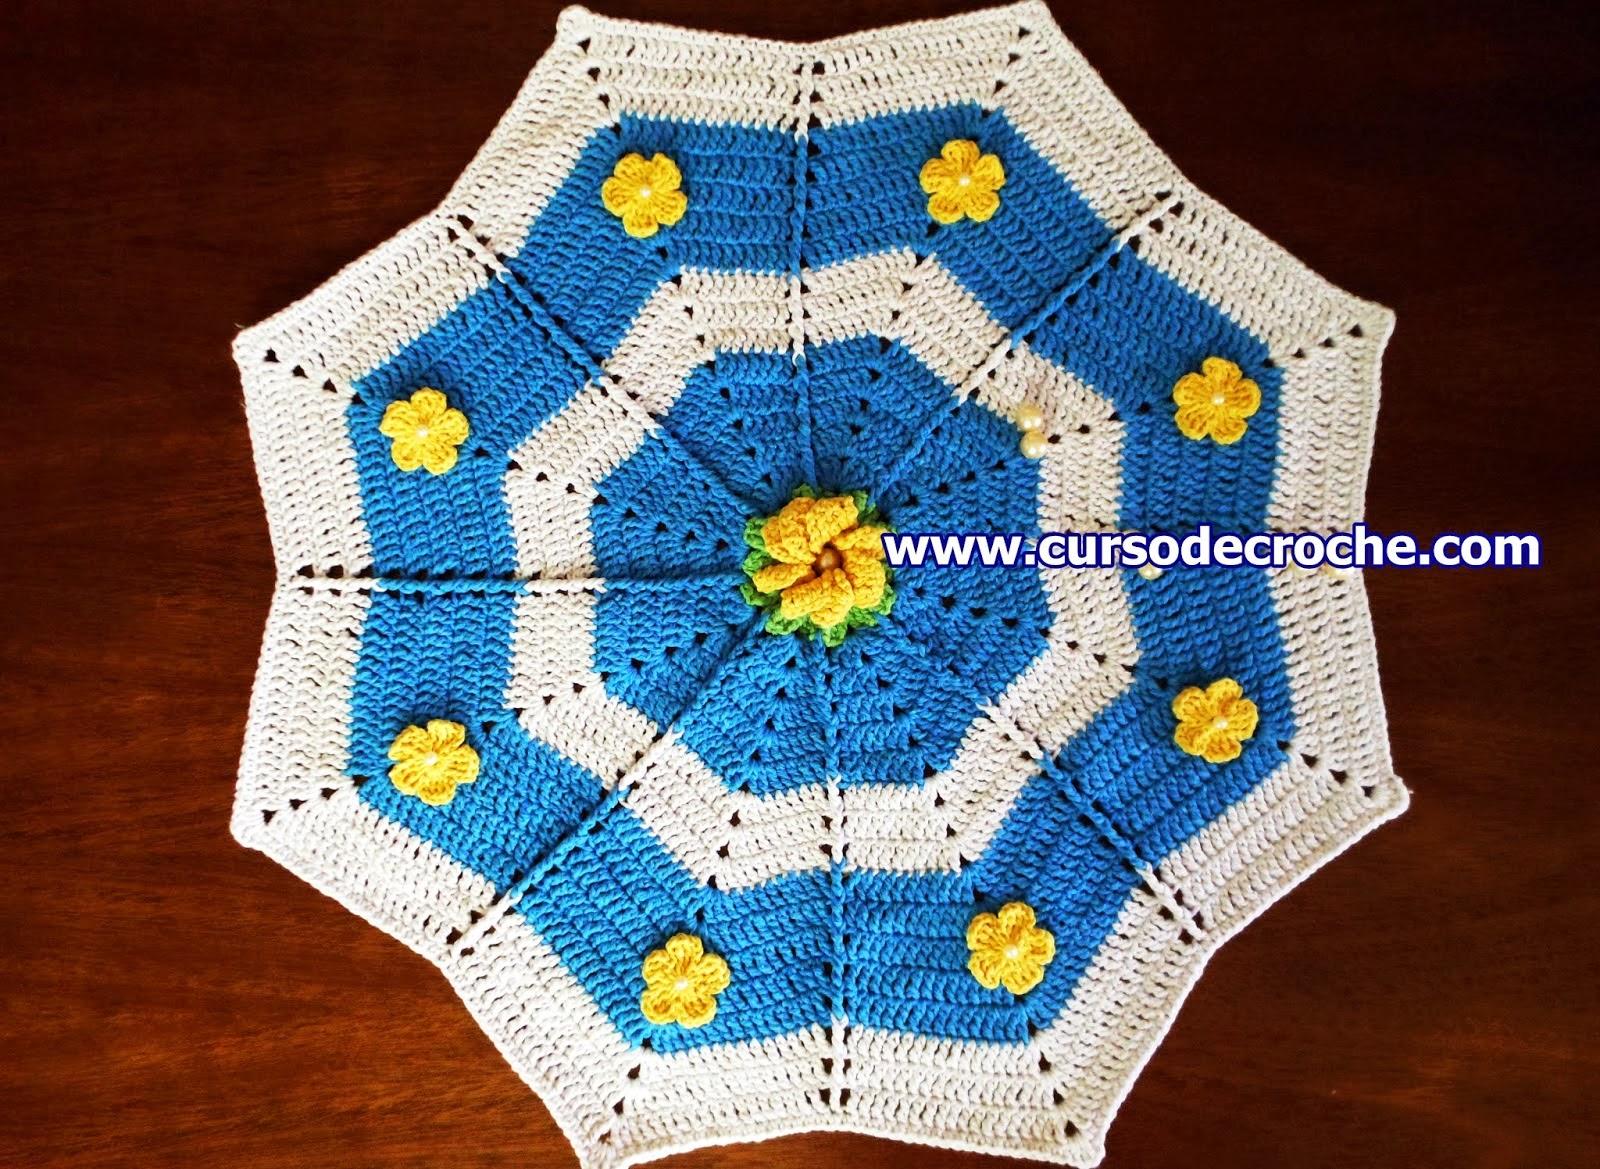 aprender croche tapetes estrela floral branco azul amarelo edinir-croche dvd video aulas loja curso de croche frete gratis